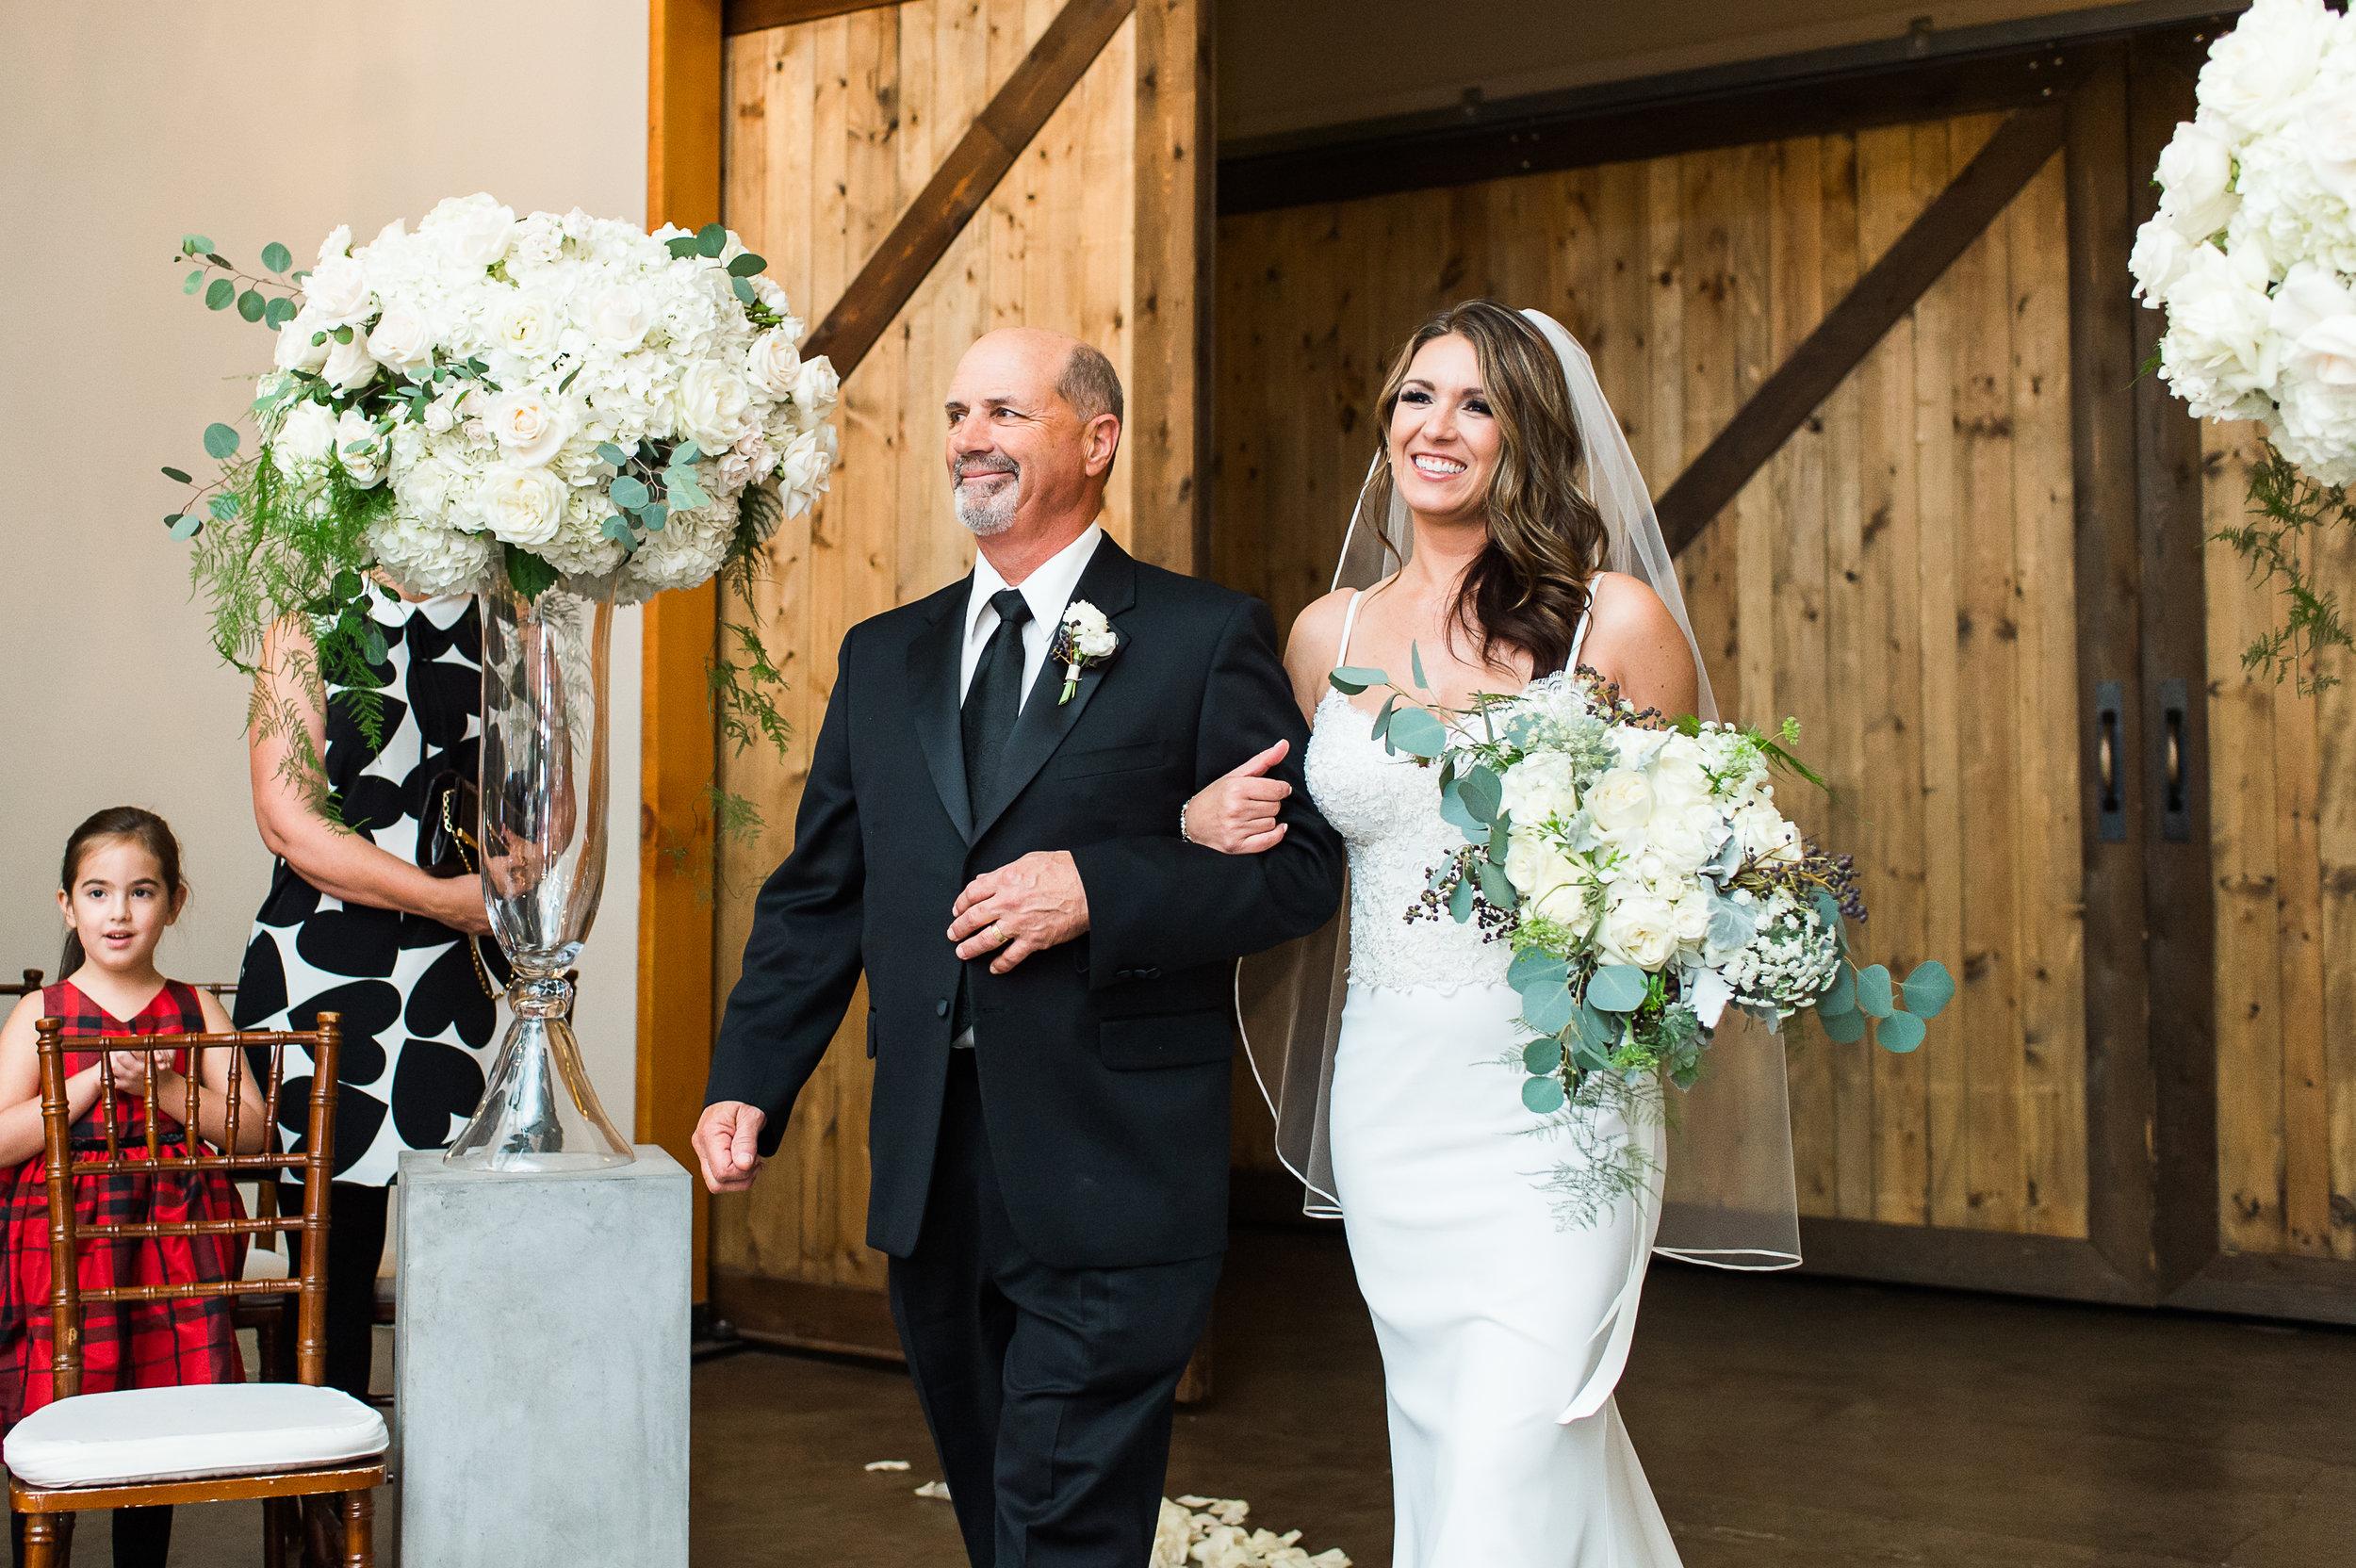 JJ-wedding-Van-Wyhe-Photography-350.jpg